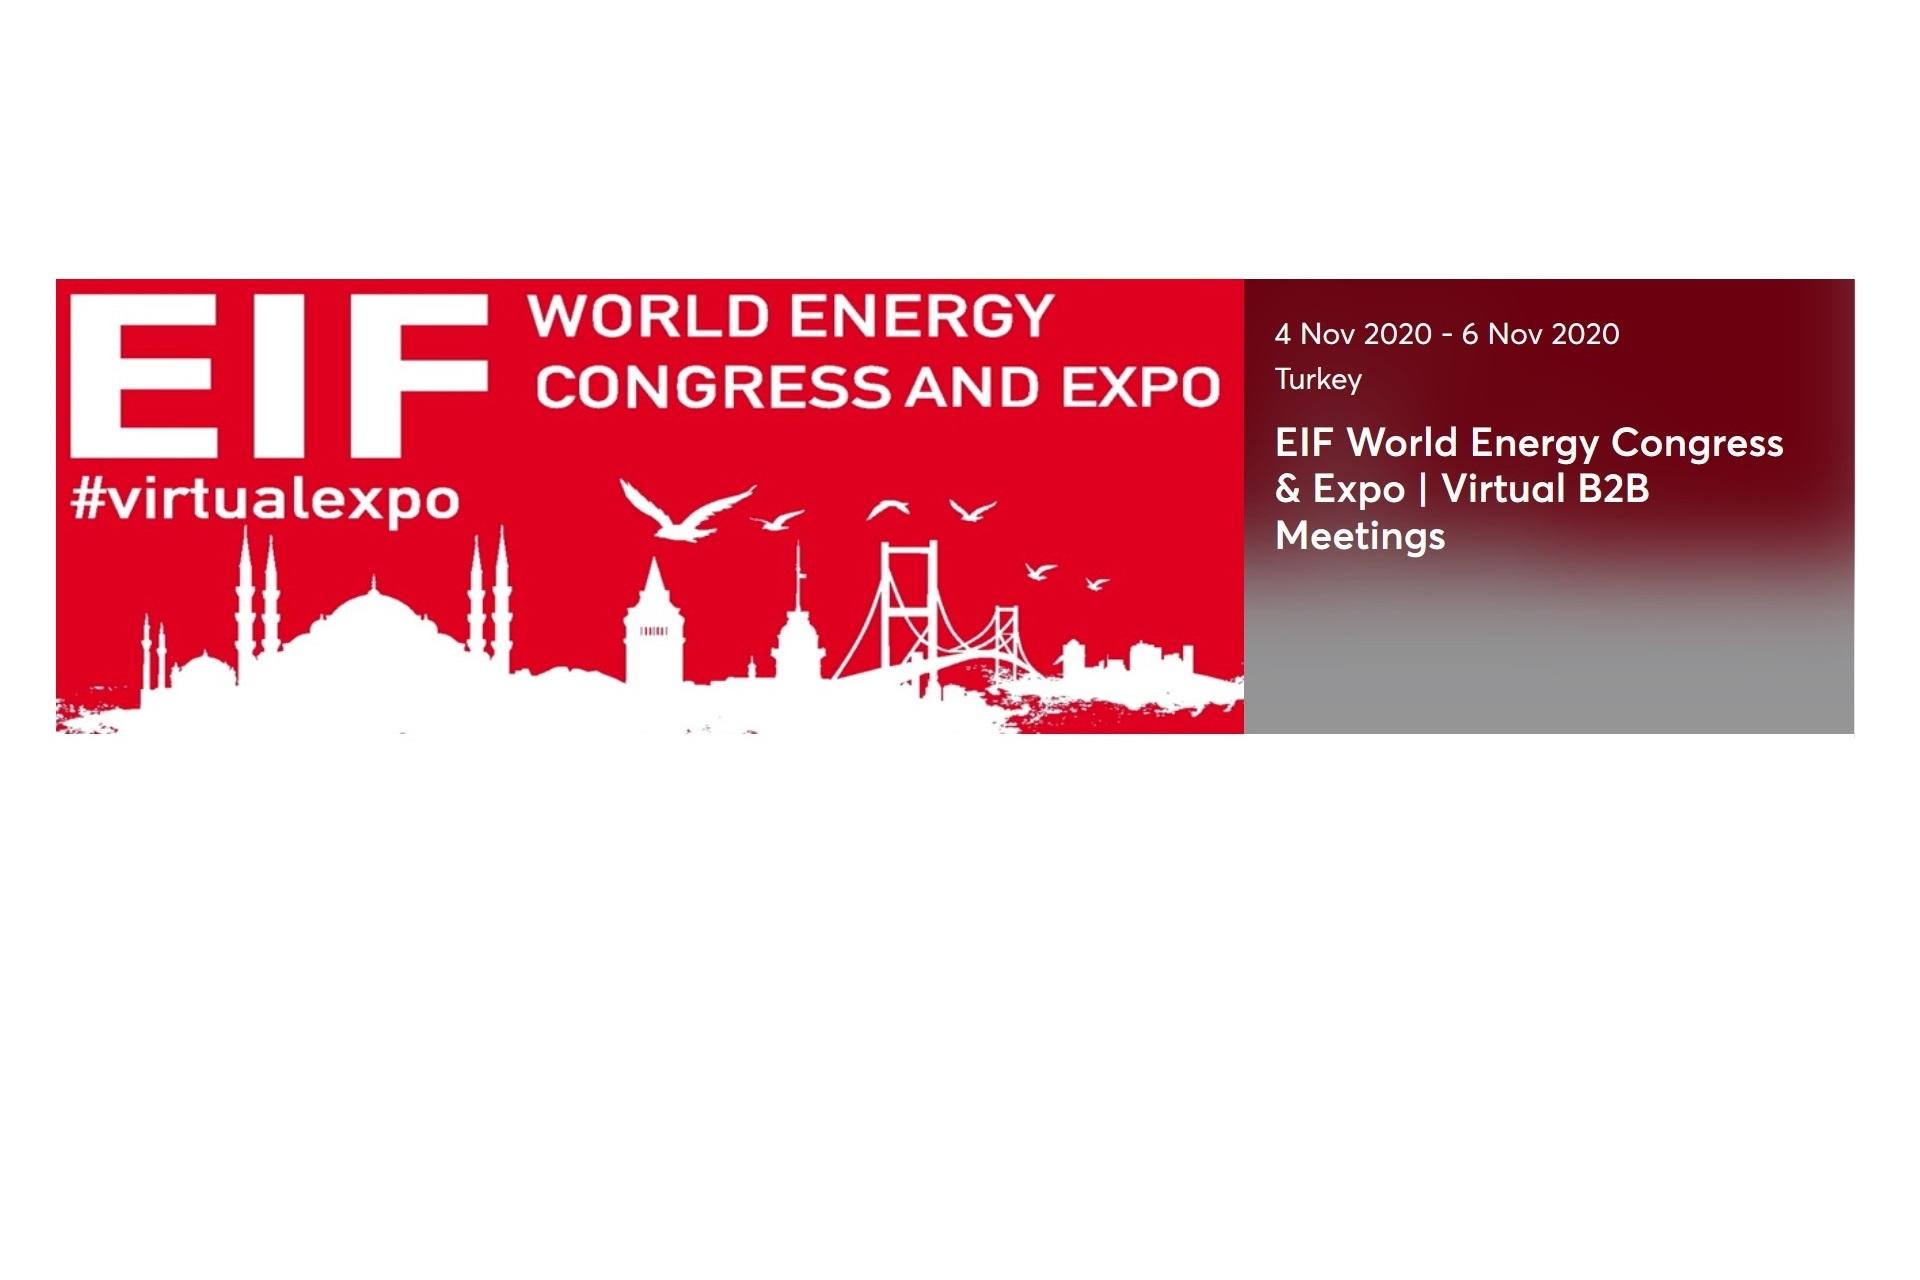 VIRTUAL MATCHMAKING EVENT EIF 2020 DIGITAL ENERGY CONGRESS & EXPO